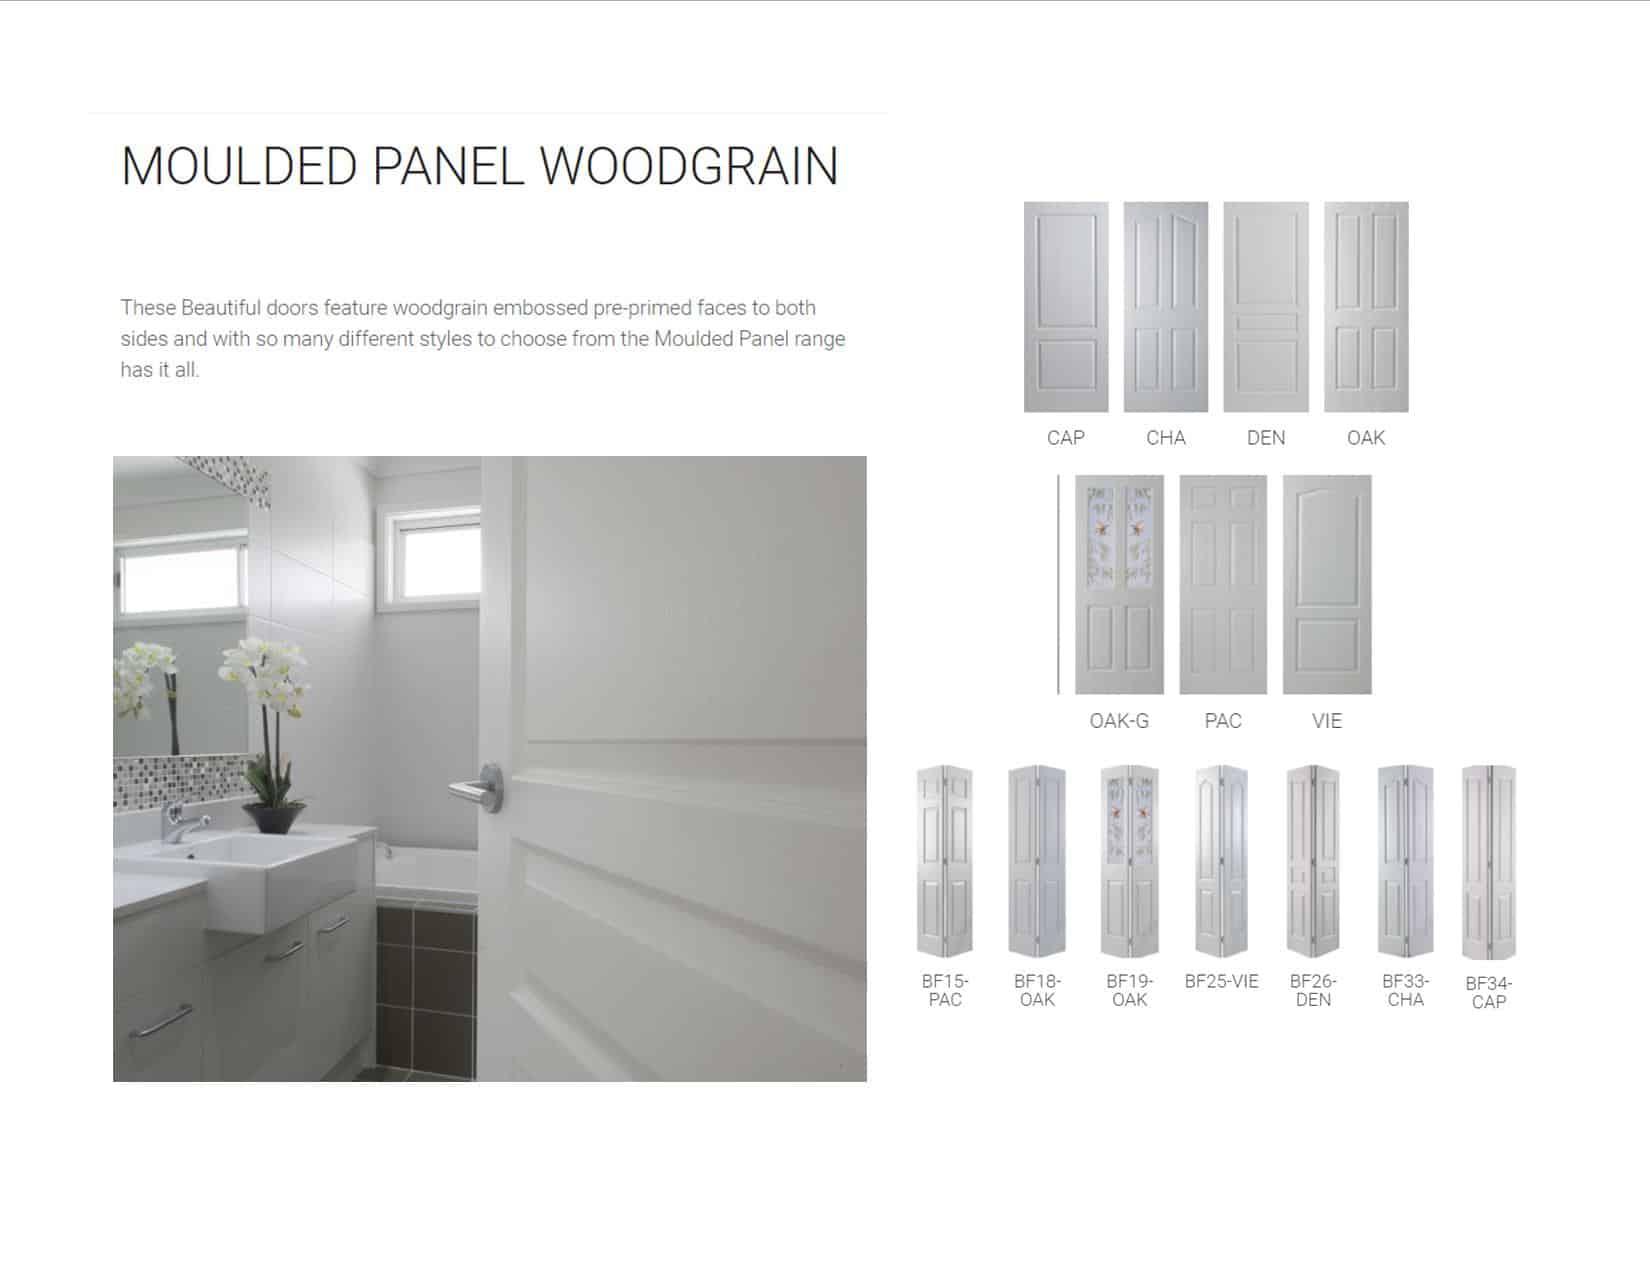 Moulded-Panel-Woodgrain